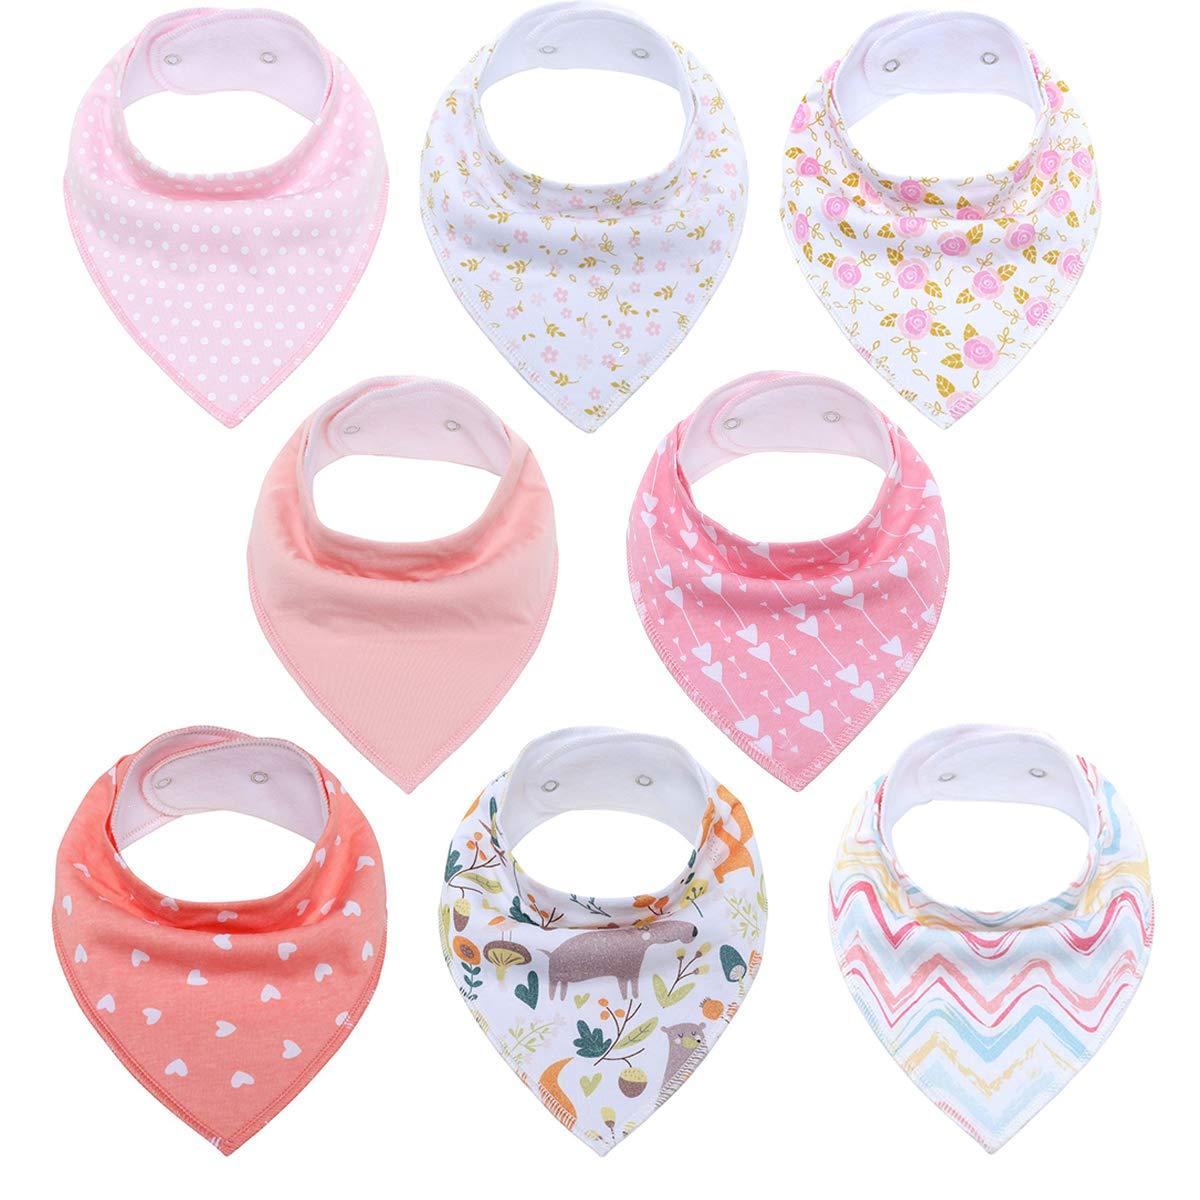 Baby dribble bibs handmade teething fabric rings bandana bibs new baby gift baby